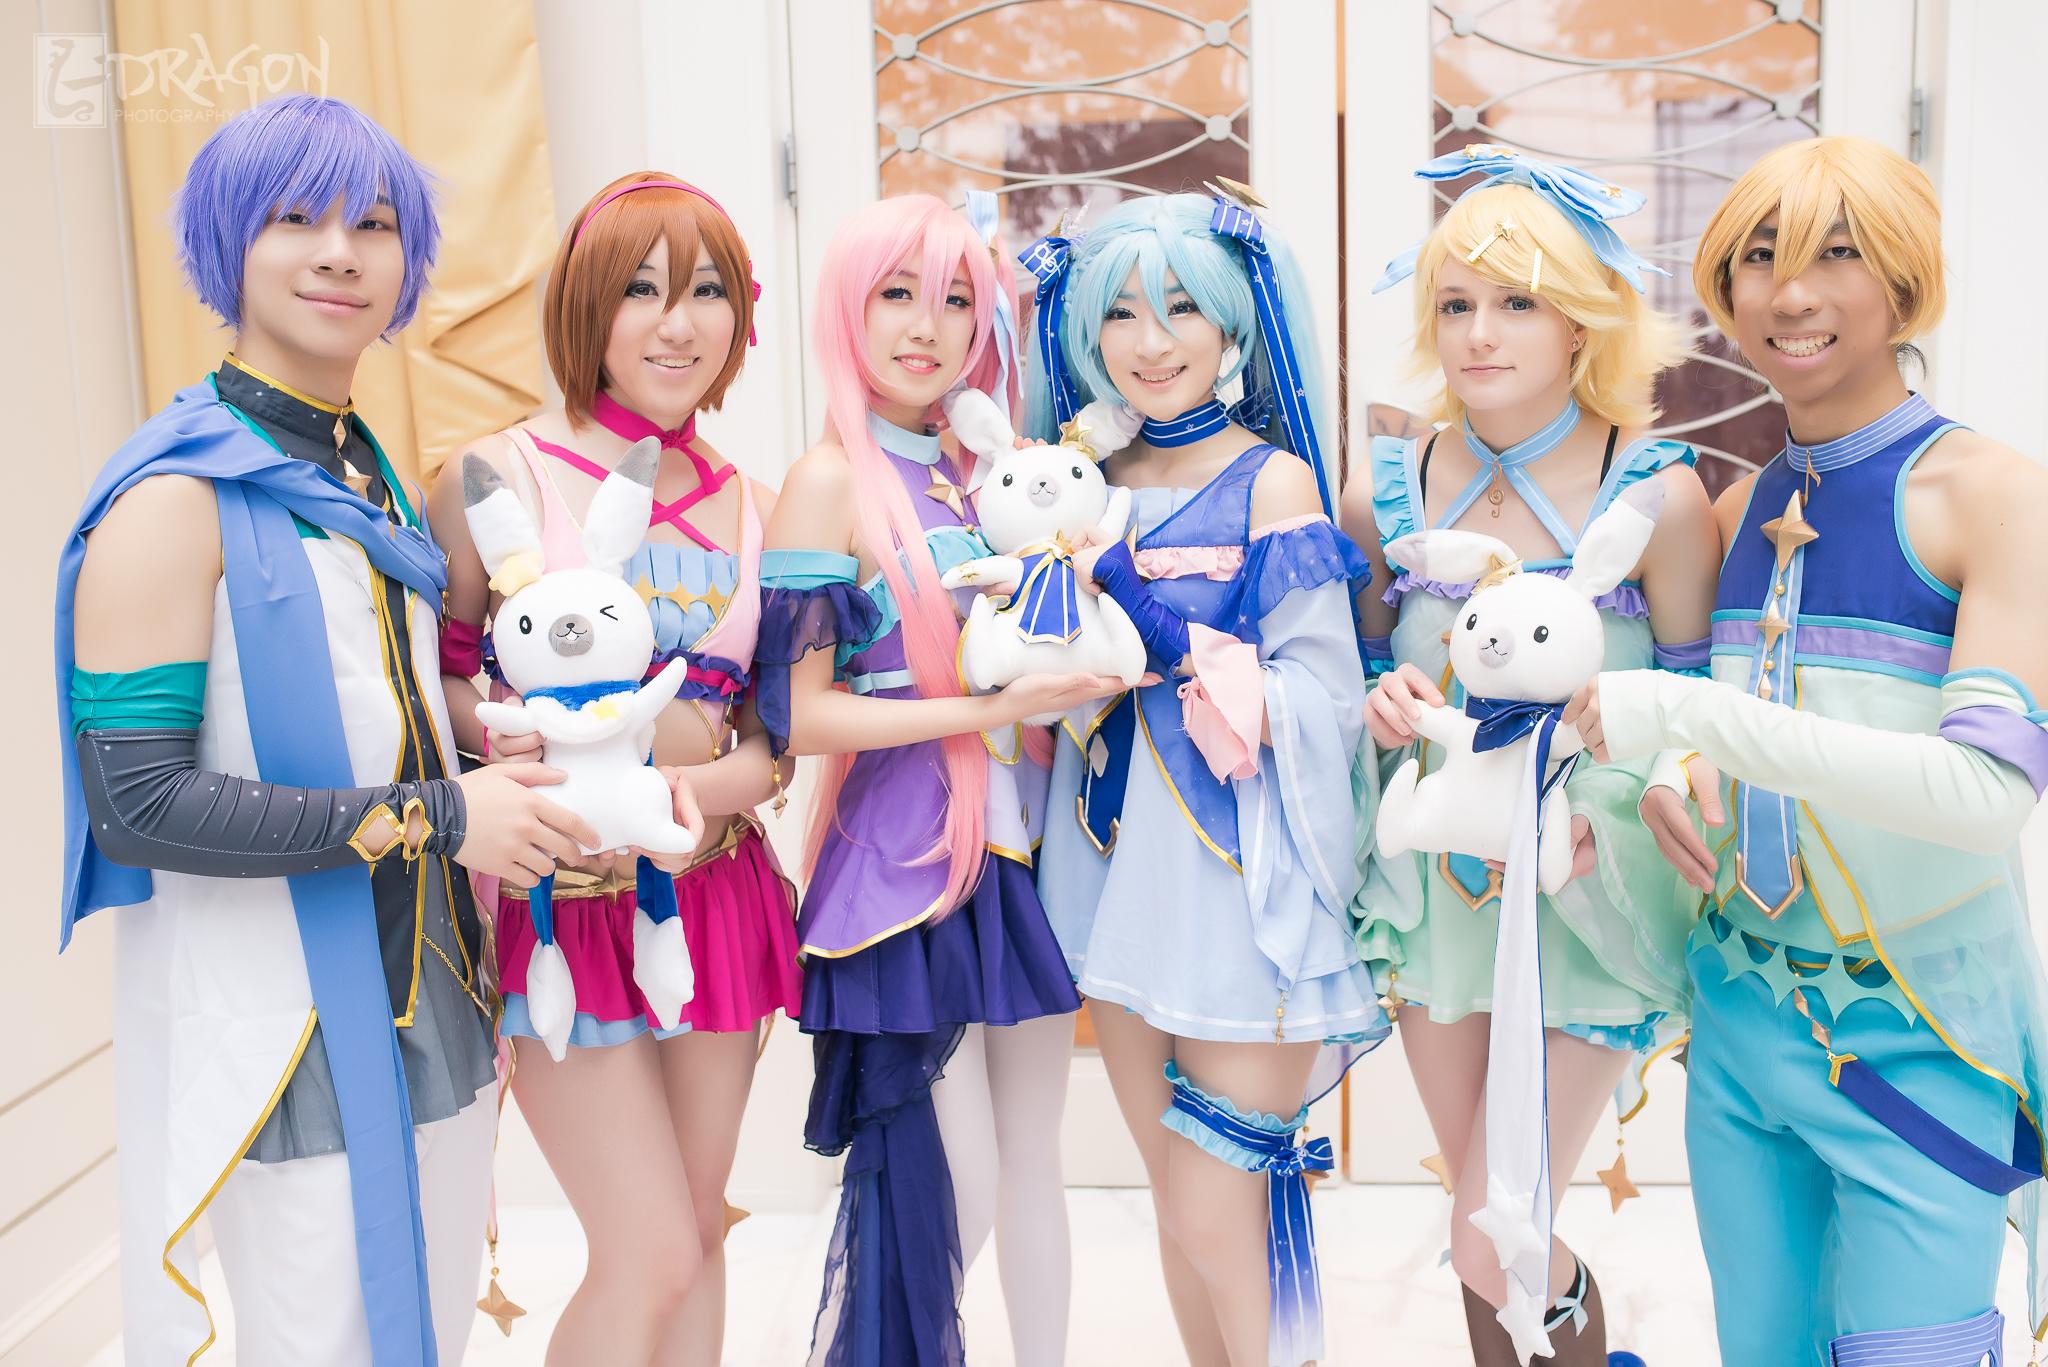 Meiko:  Zeylia Wing Cosplay   Luka:  KEKKI ケキ   Miku:  Pandu Cosplay   Rin:  Vyda Cosplay   Kaito: (No Cosplay account)  Len: (No Cosplay account)  Photo:  L-Dragon Photography